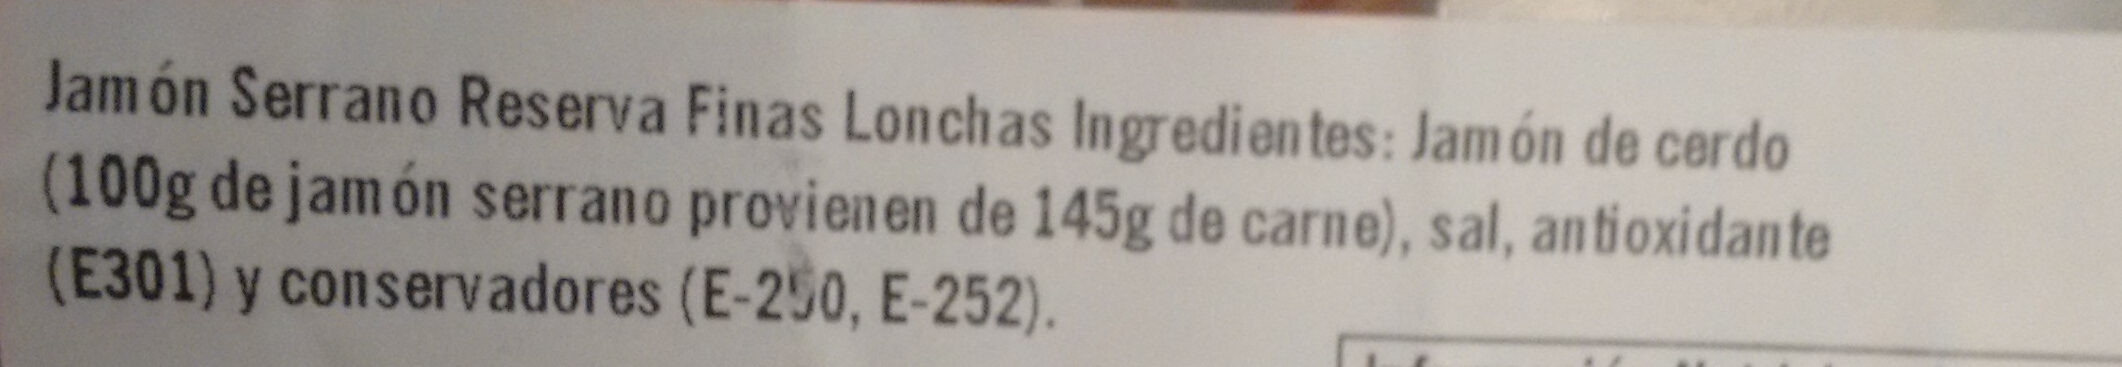 Jamón Serrano reserva selección - Ingredients - en